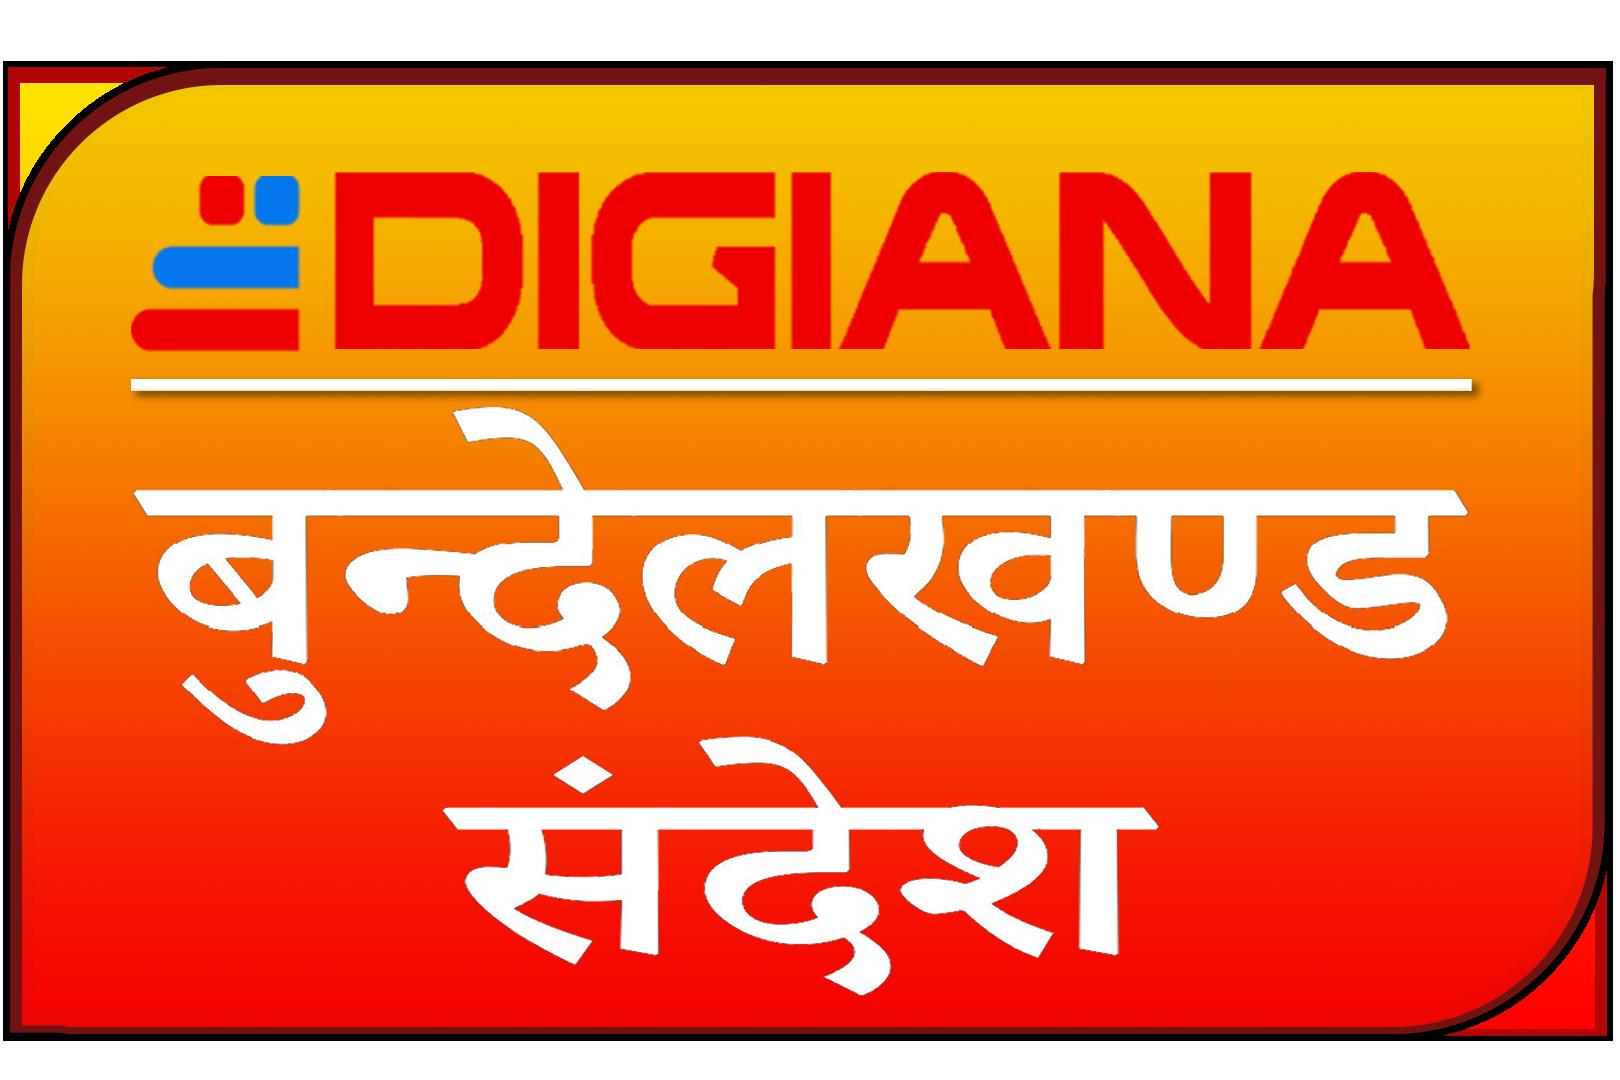 http://digiana.com/assets/uploads/live_tv/20211023170739.png